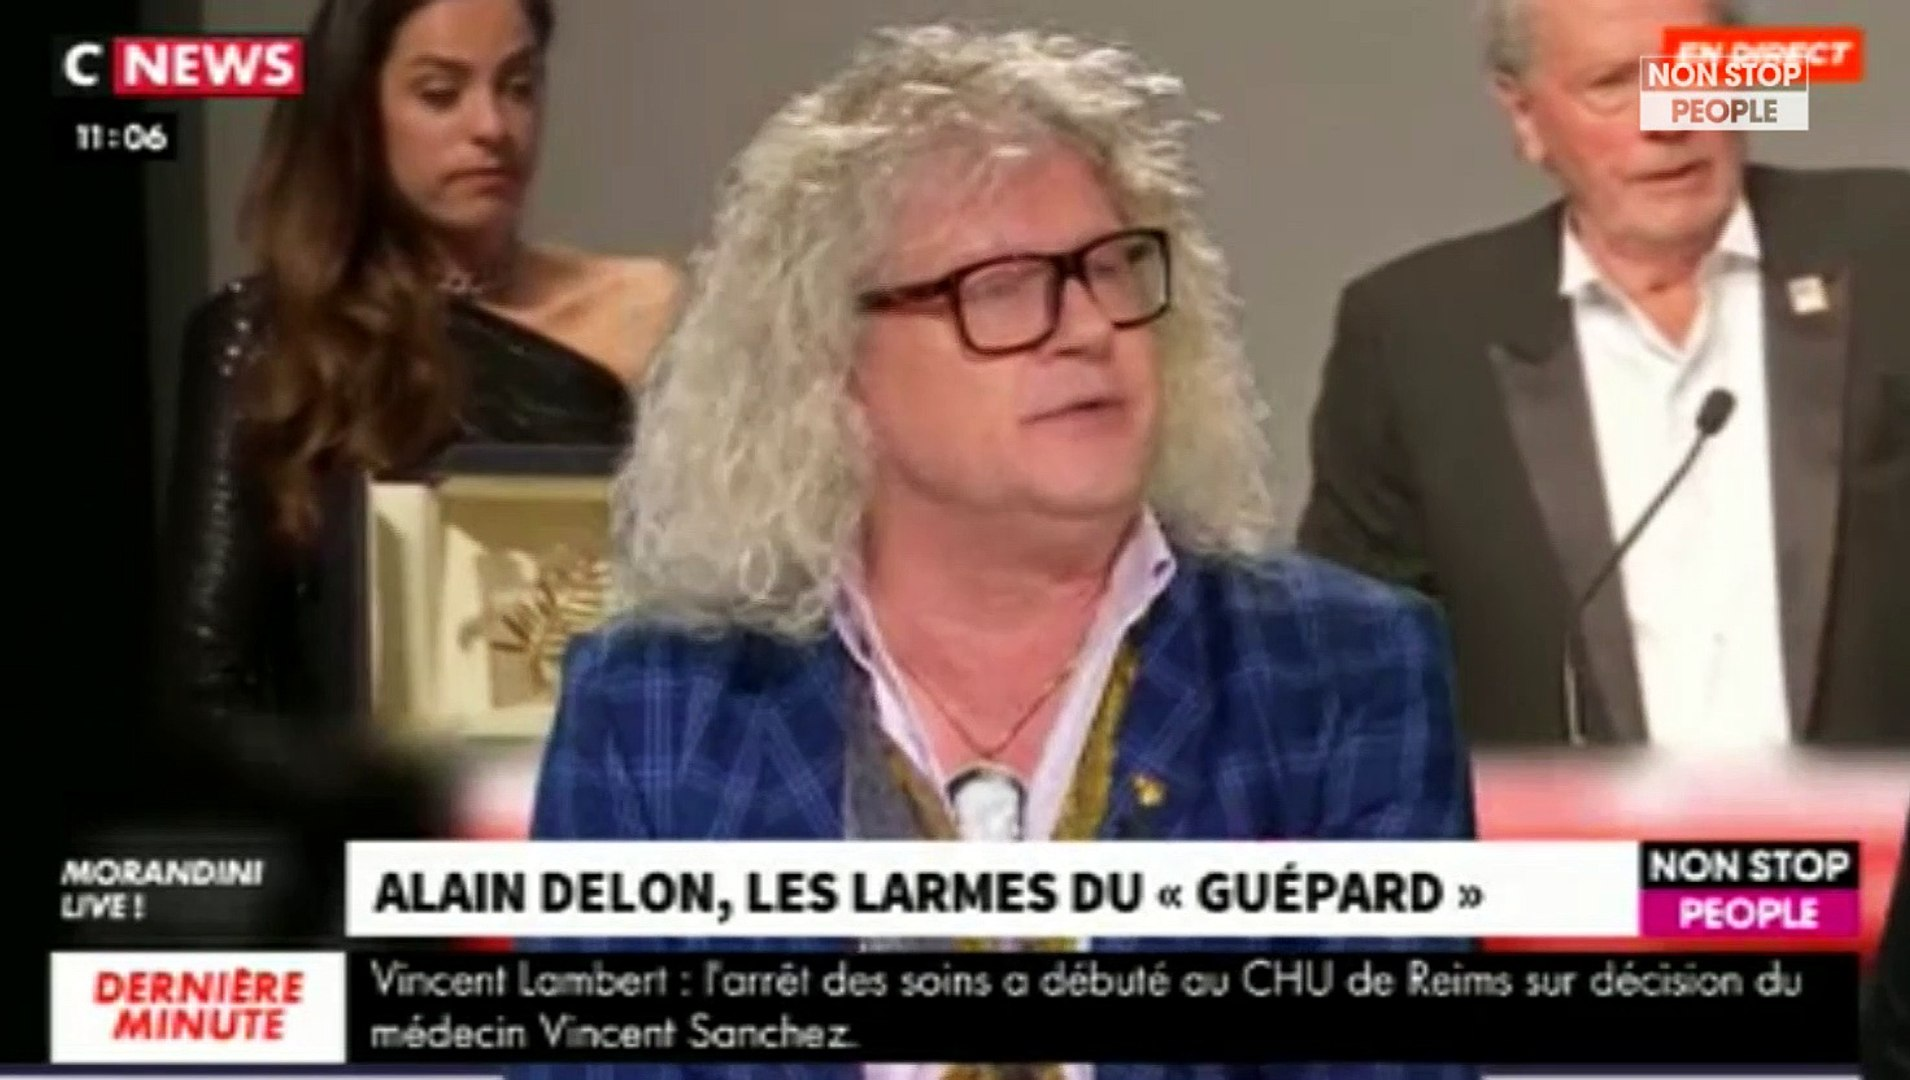 Morandini Live : Alain Delon